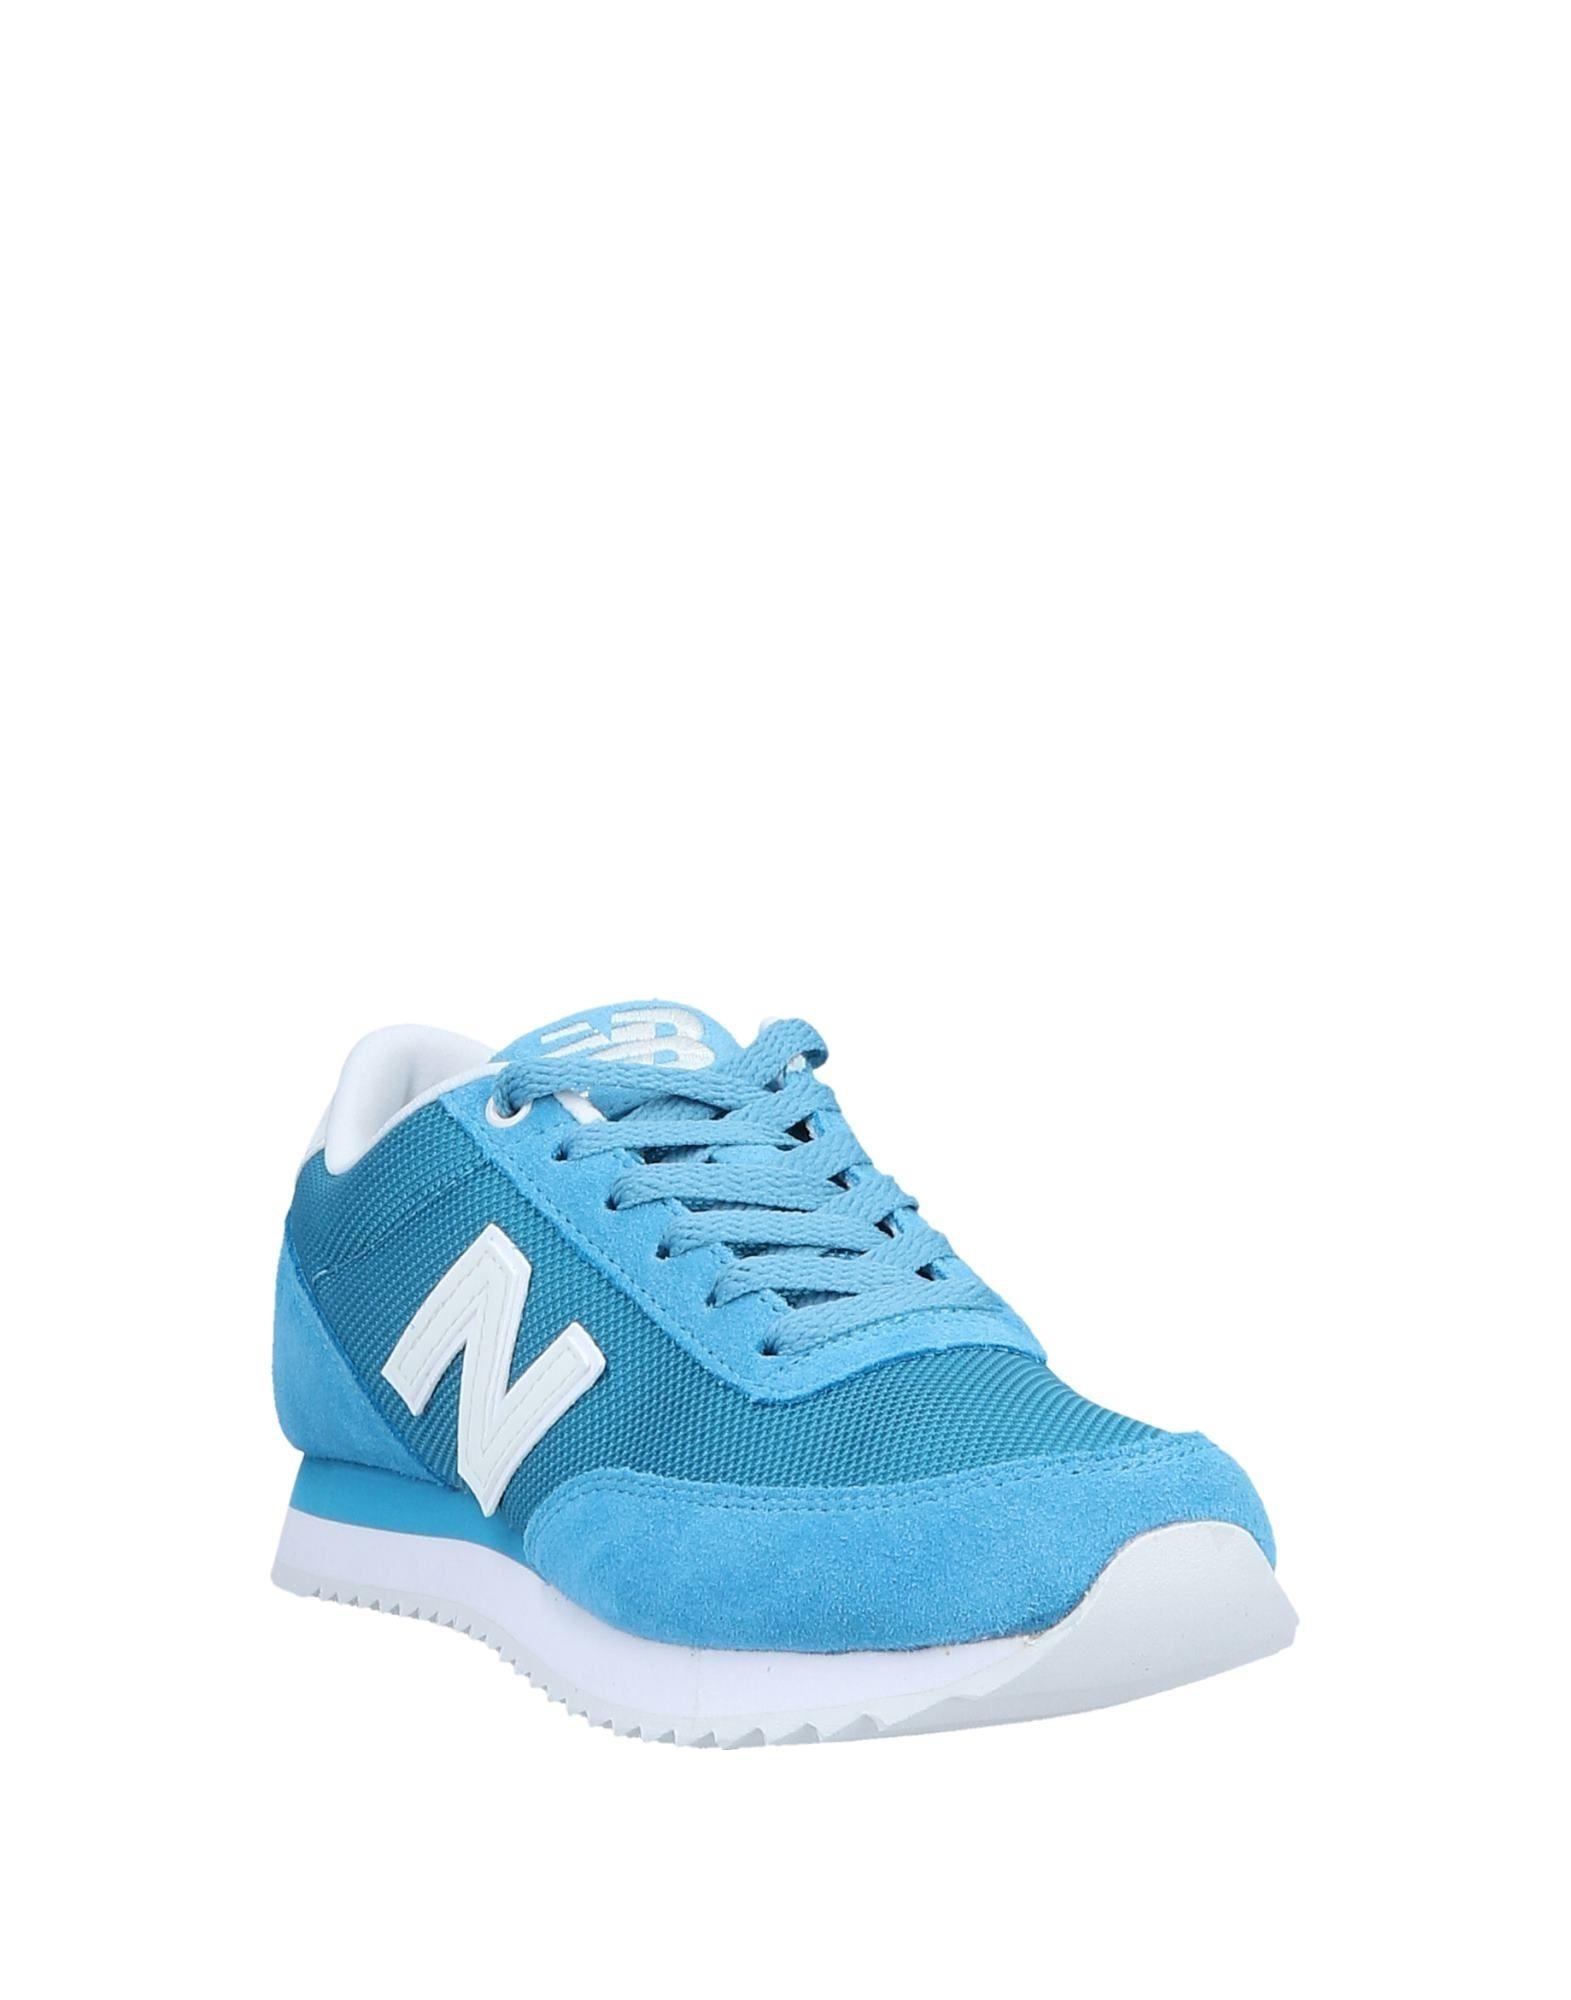 New Balance Sneakers lohnt Damen Gutes Preis-Leistungs-Verhältnis, es lohnt Sneakers sich 3006 98fd3c